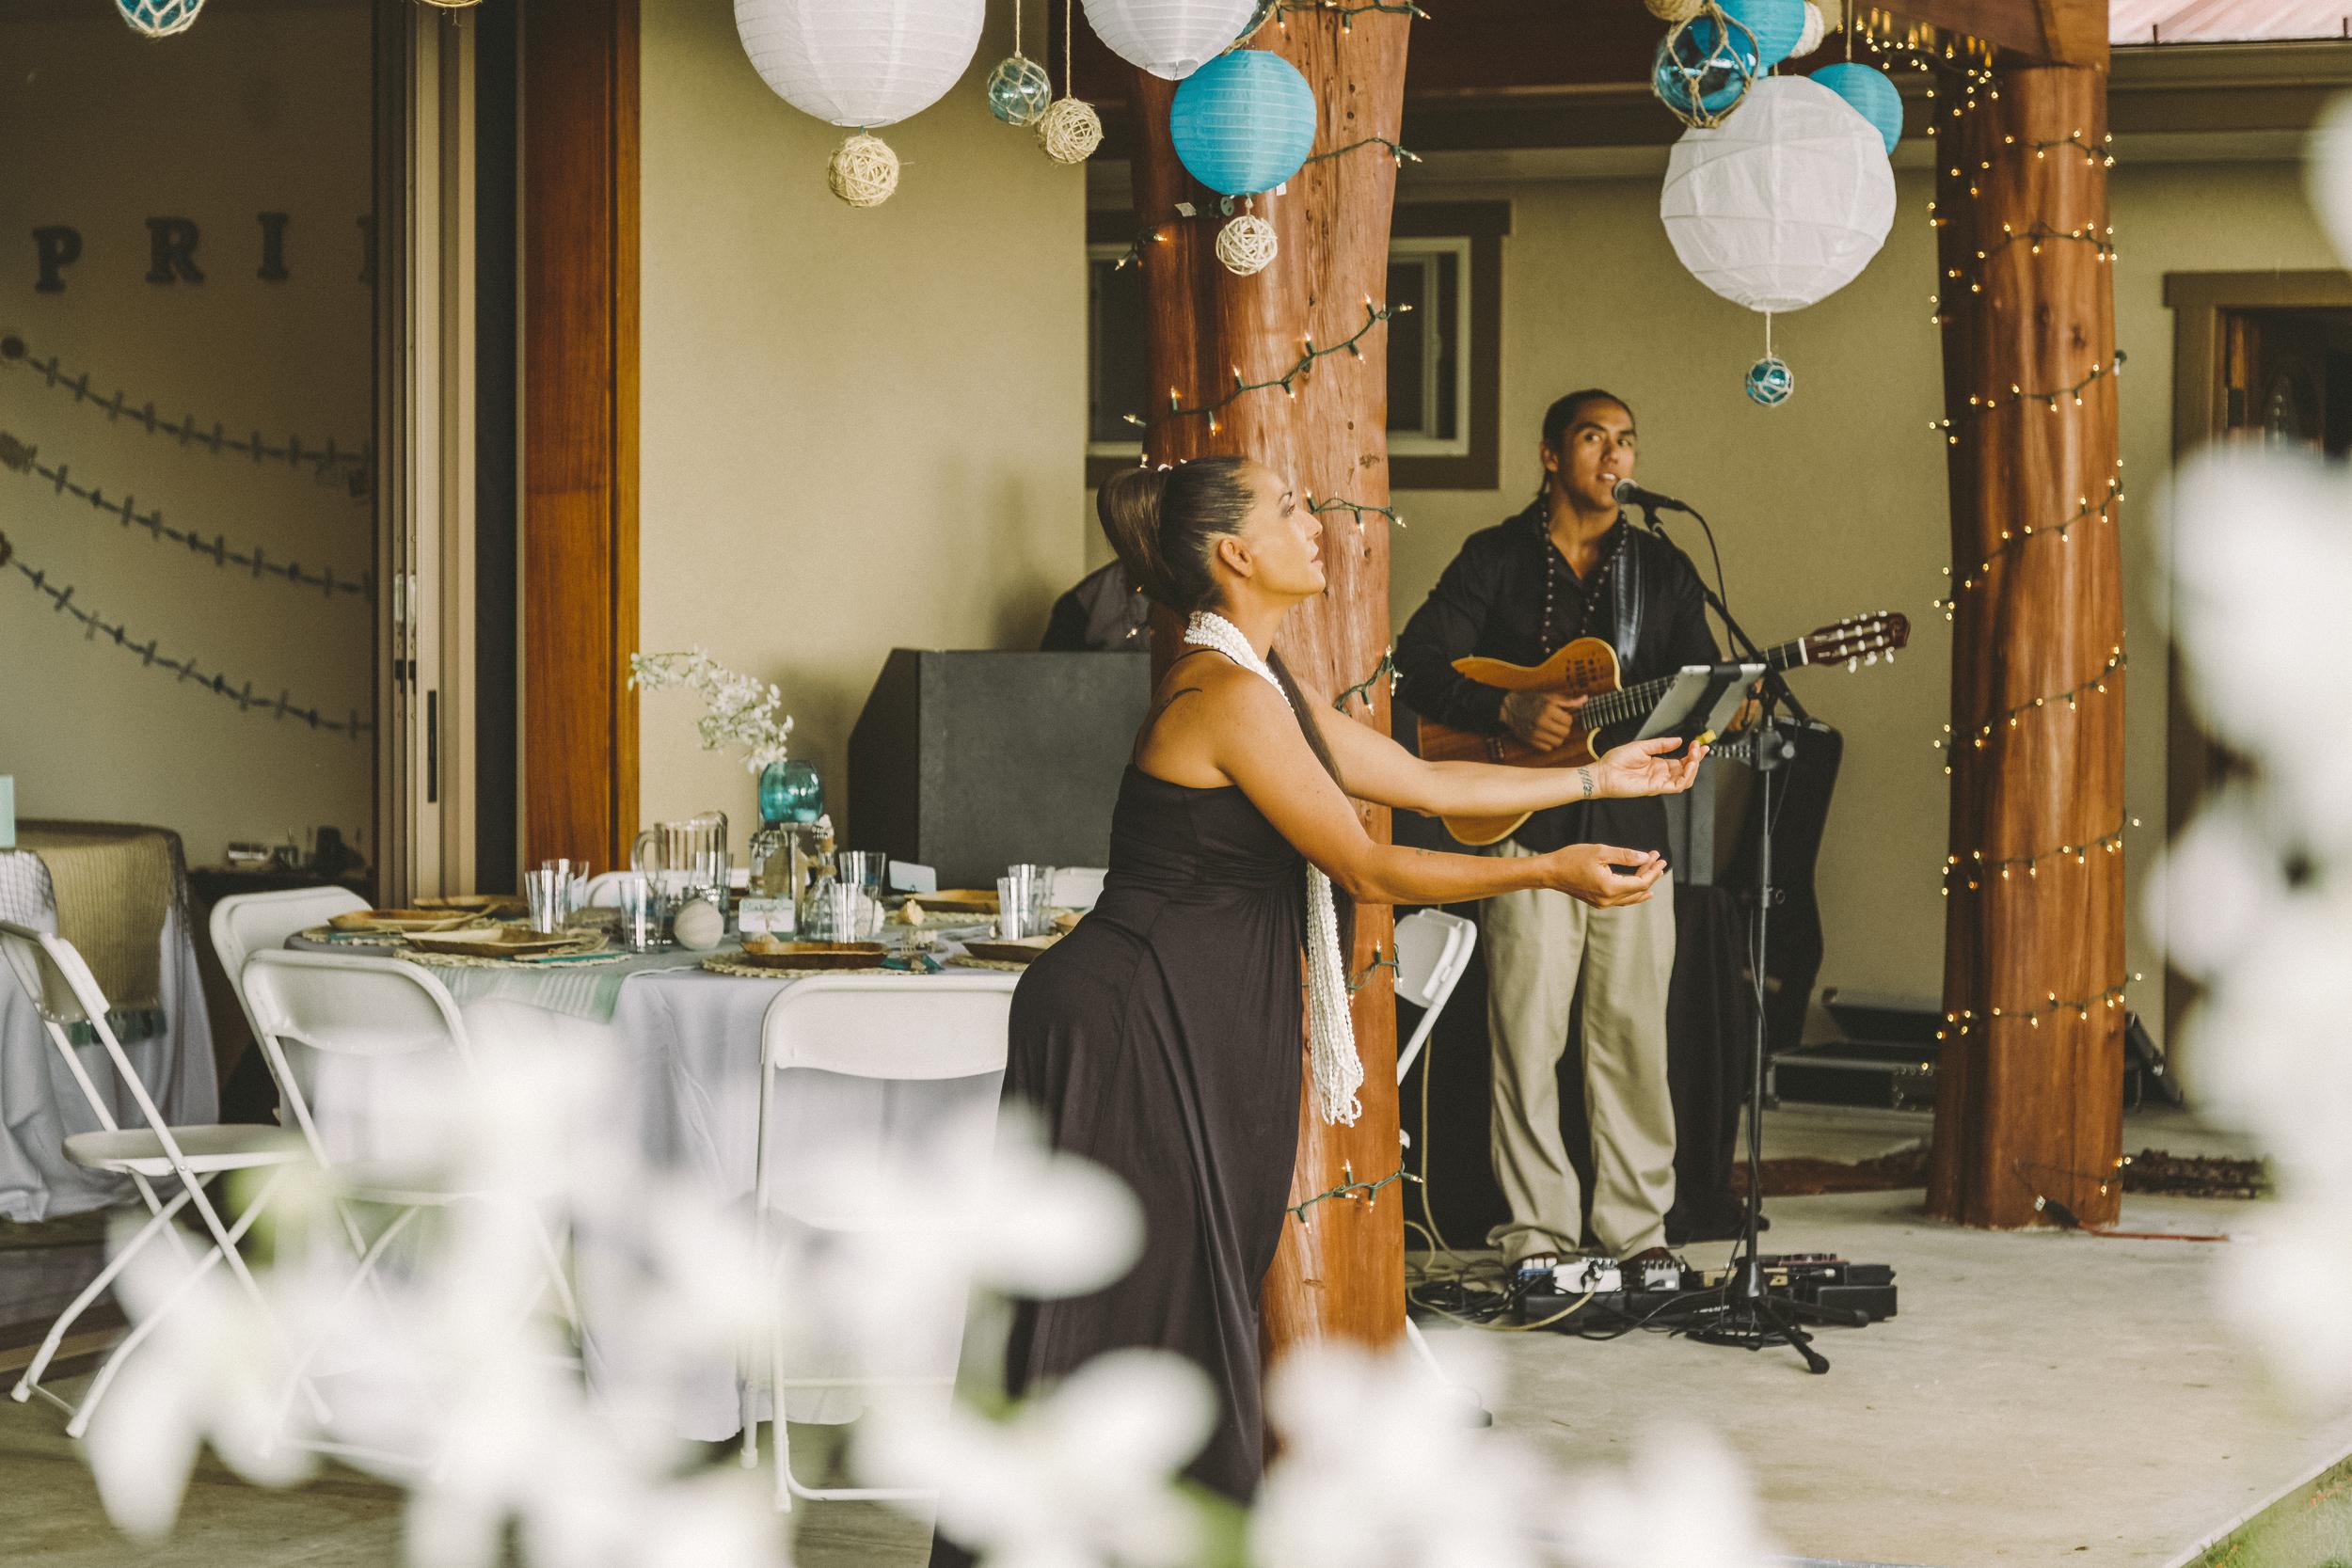 angie-diaz-photography-hawaii-wedding-photographer-kelli-jay-113.jpg